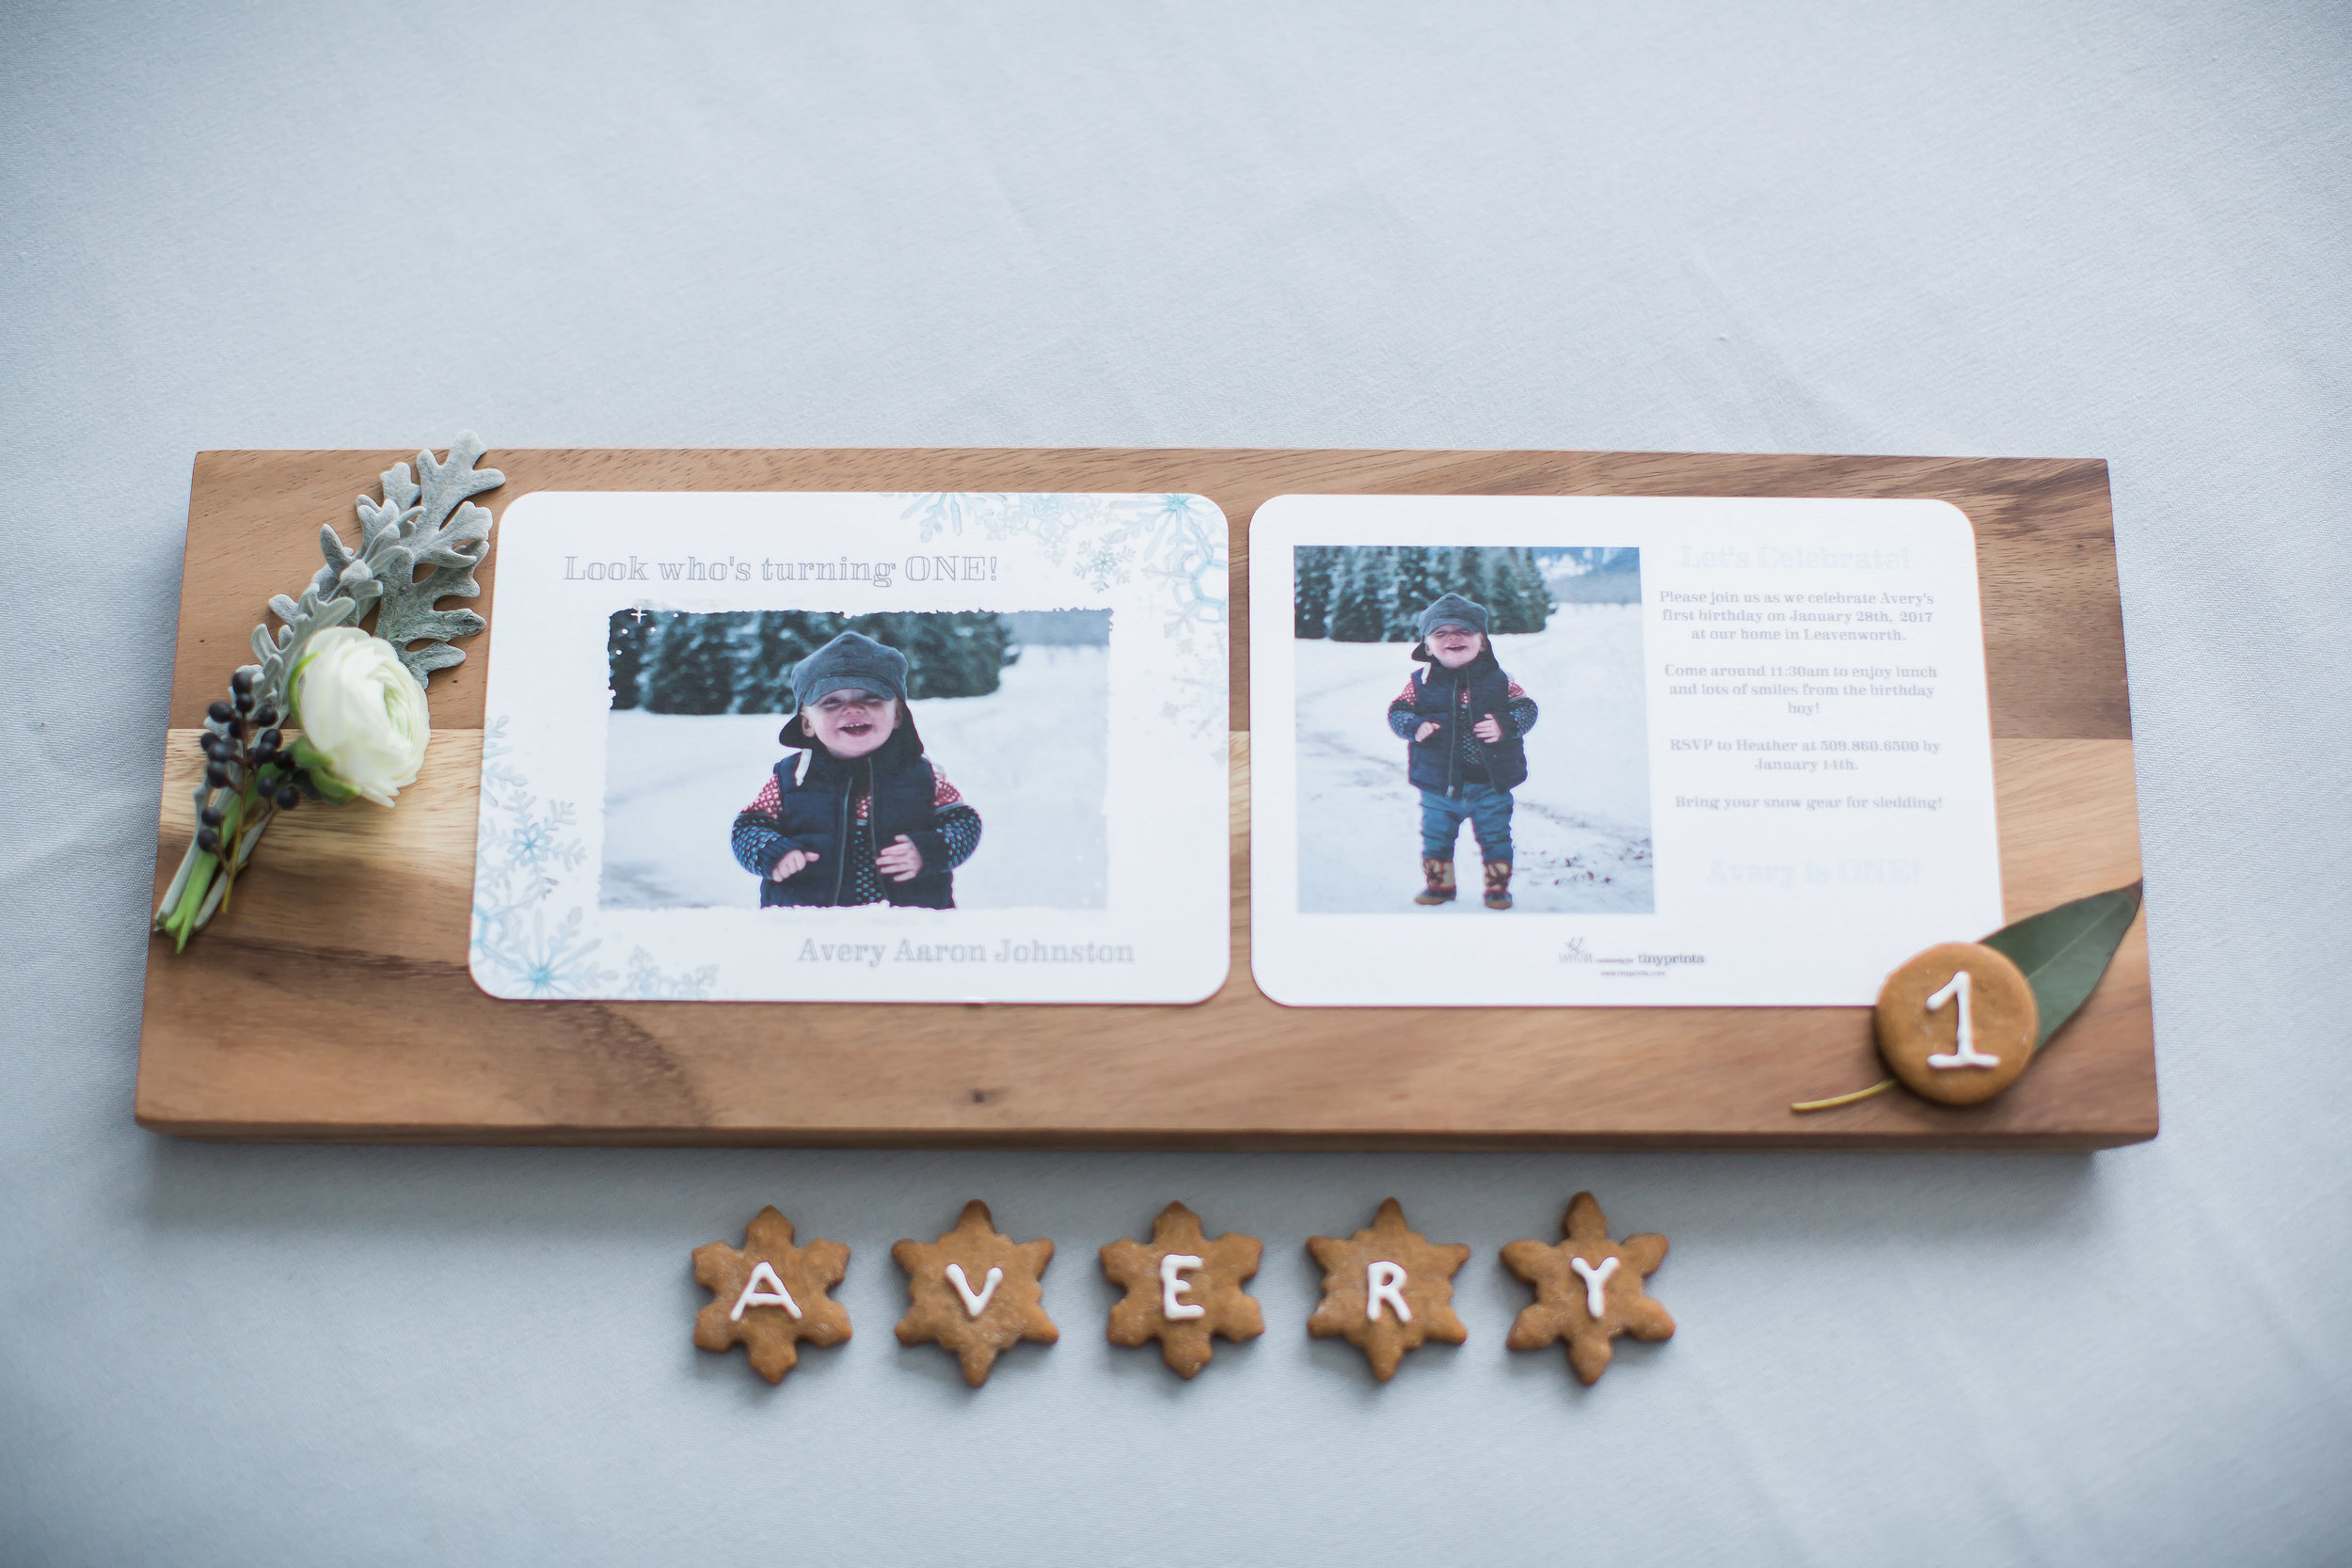 Avery1stBirthday-18.jpg